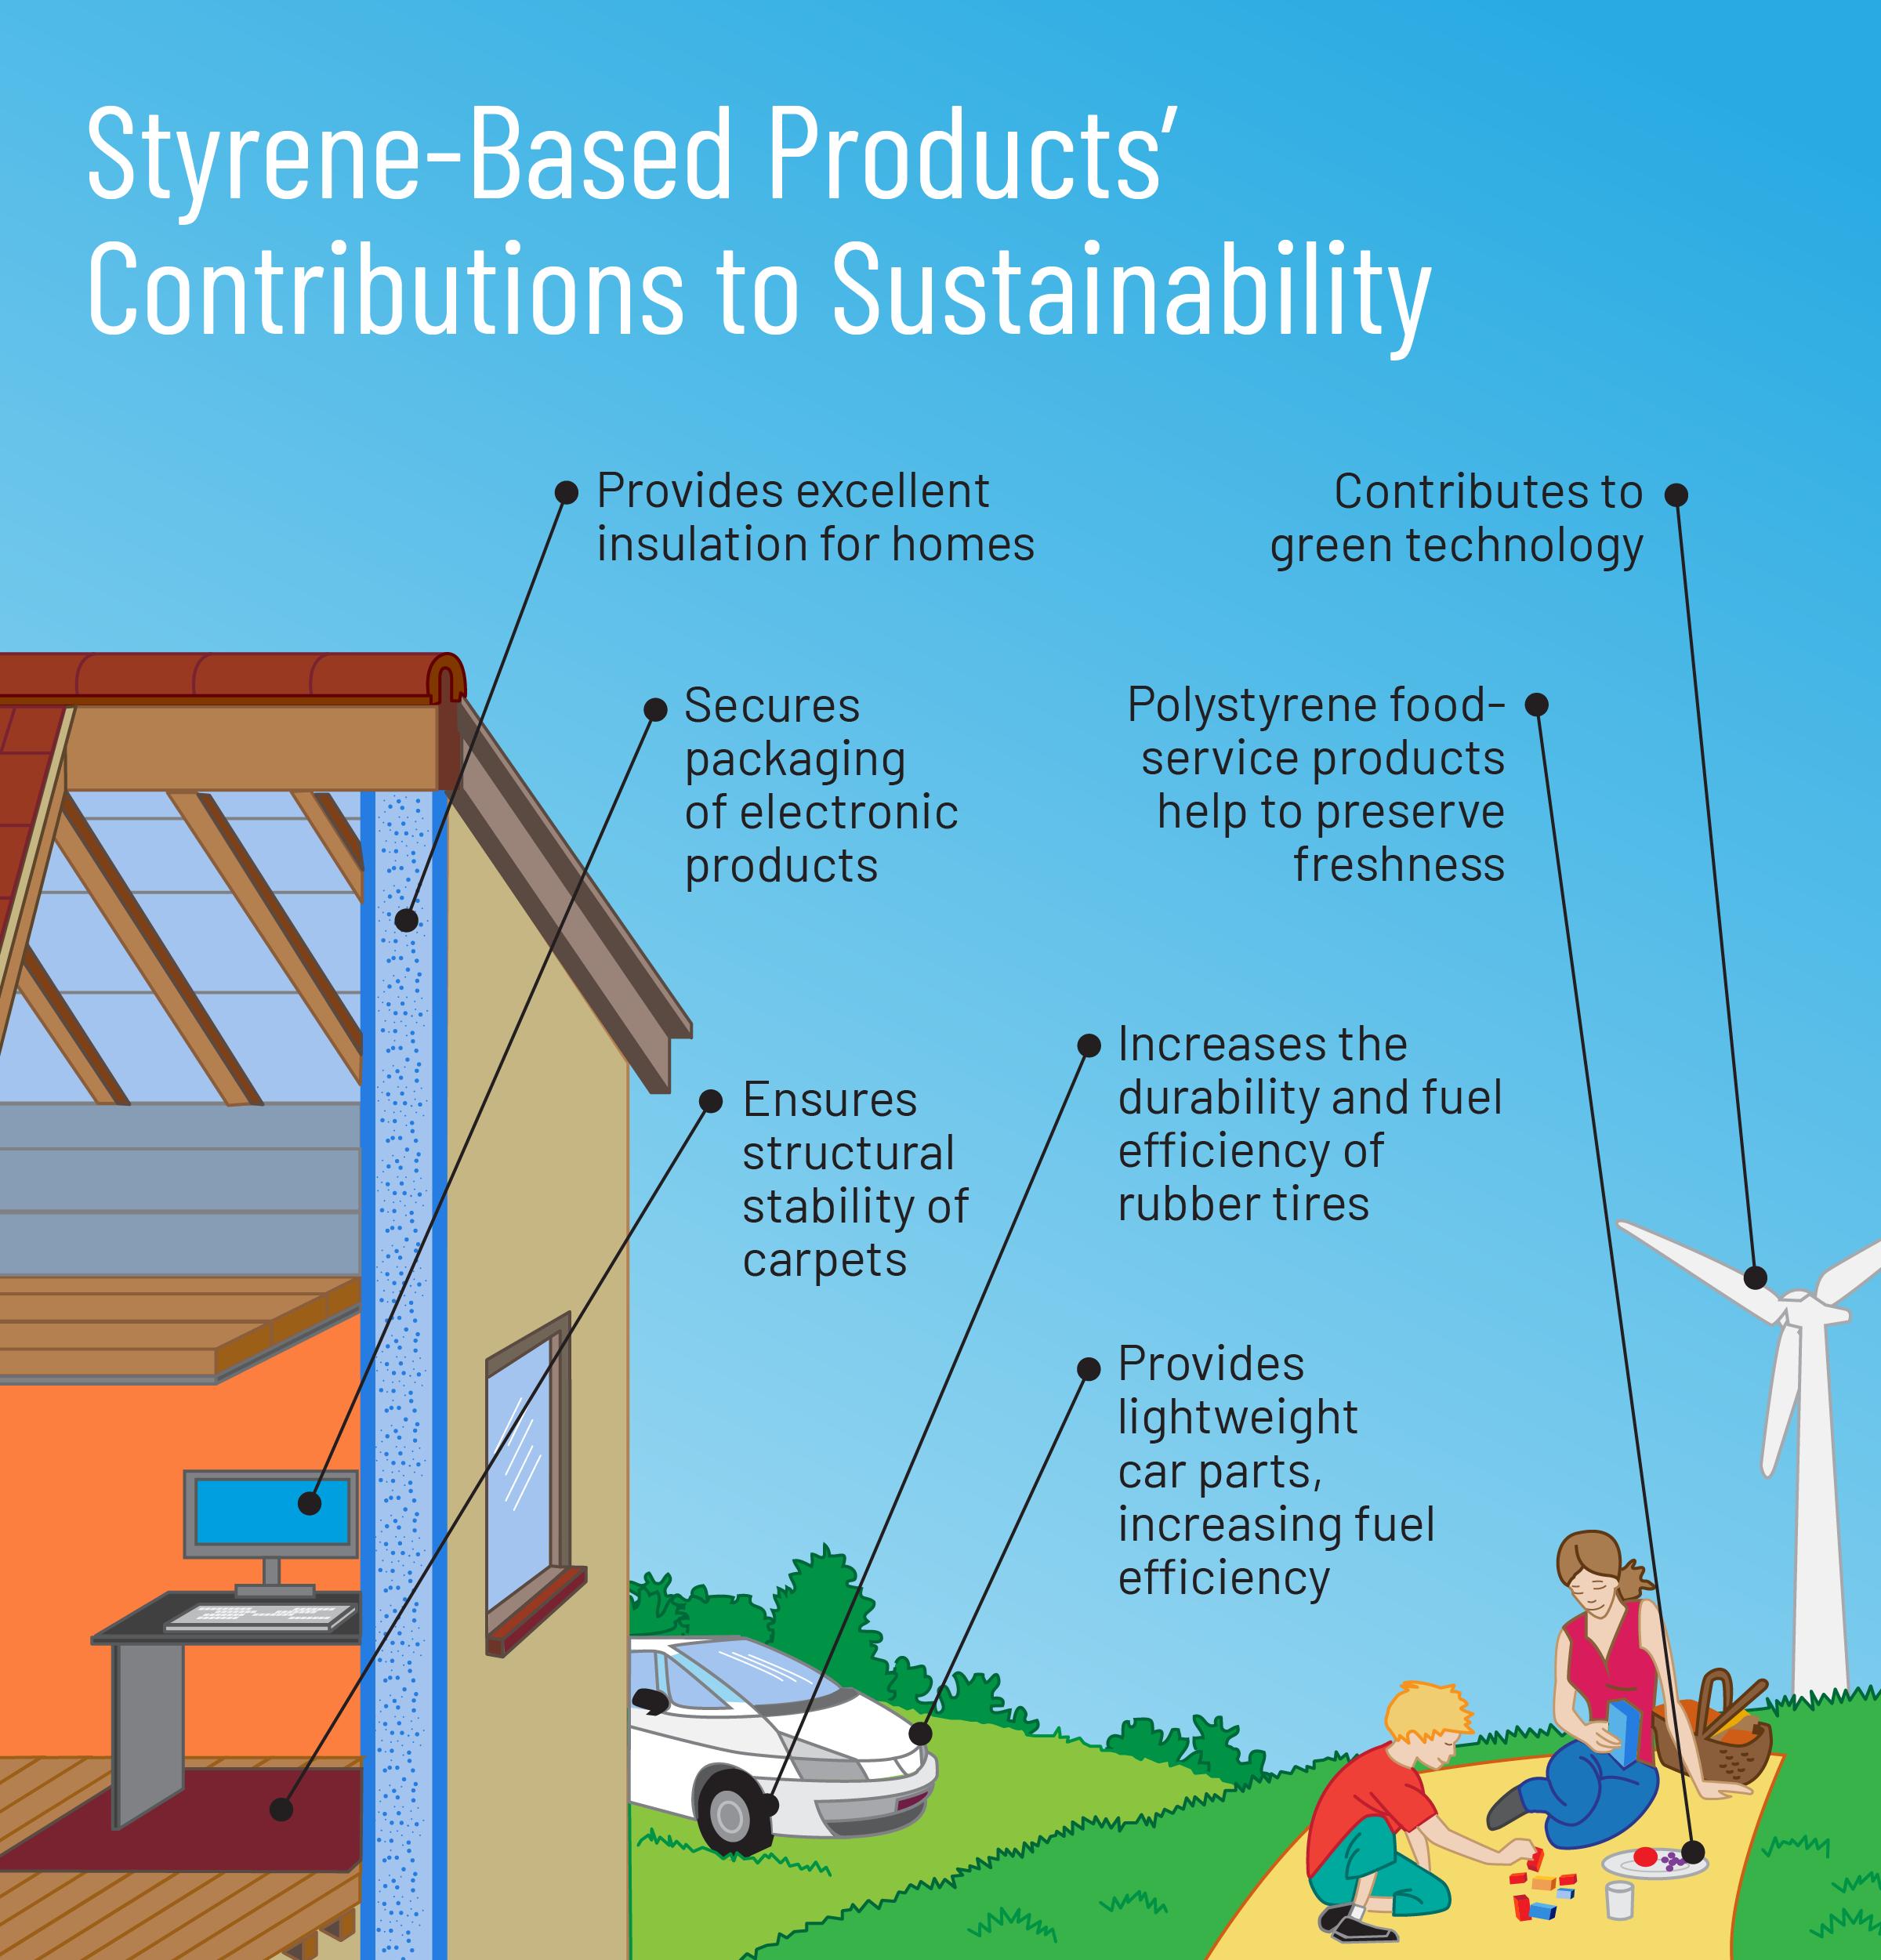 styrene-based products' contributions to sustainability